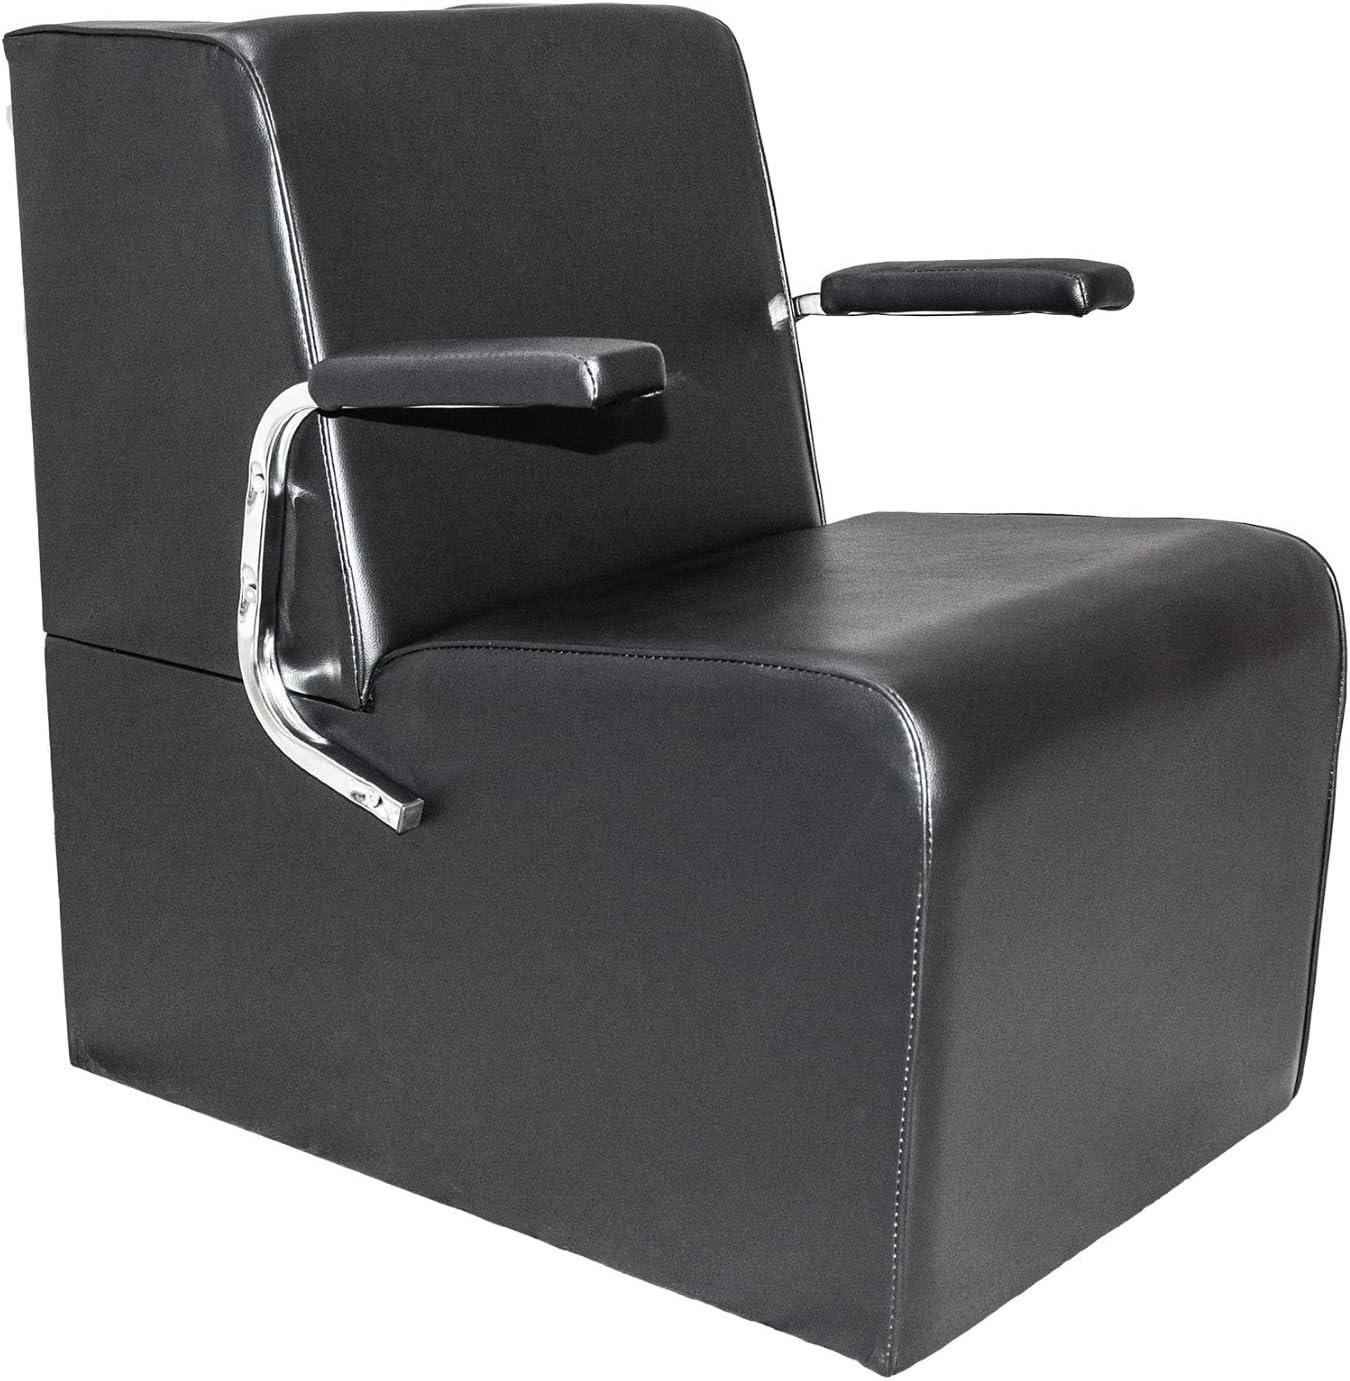 Chromium Professional Platform Dryer Chair [2037] by PureSana: Kitchen & Dining